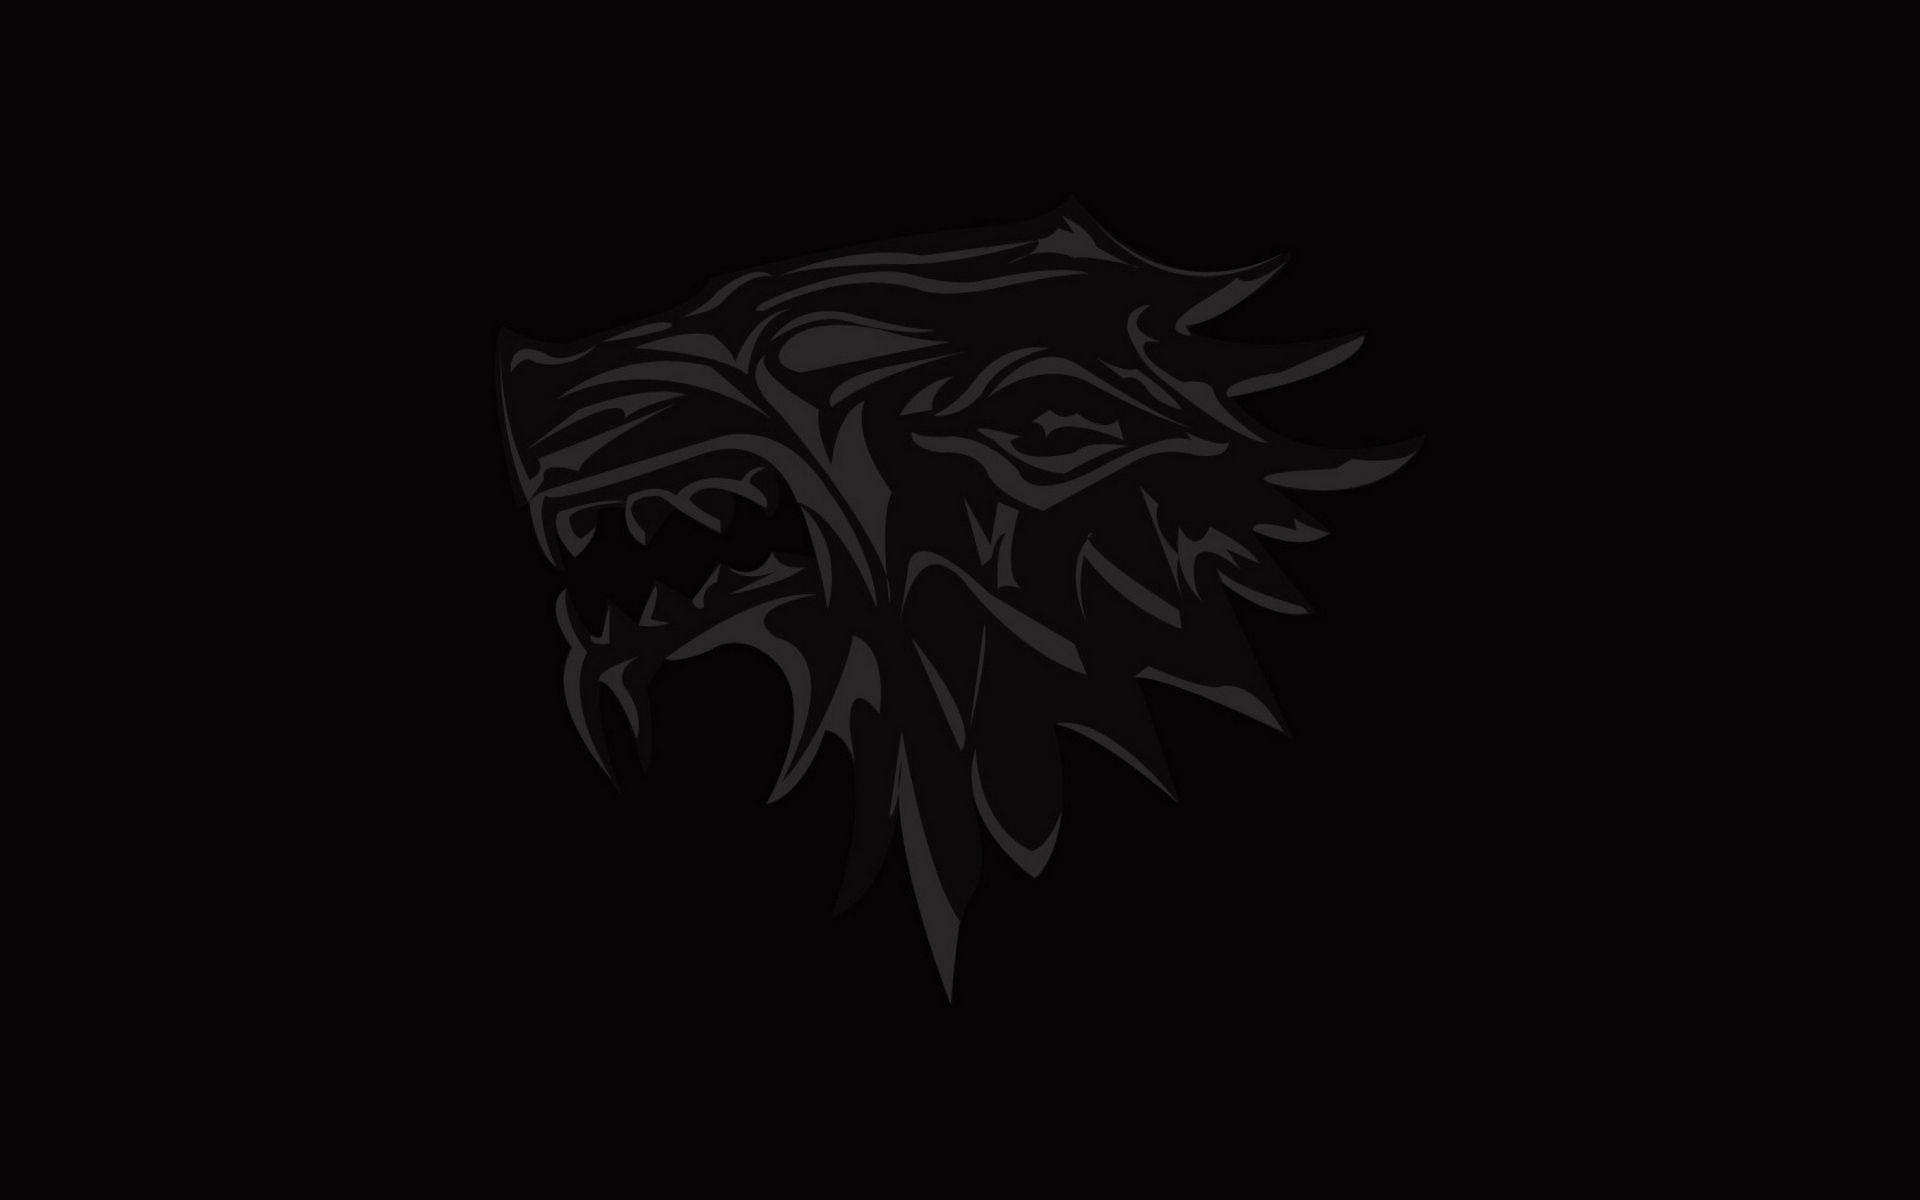 Game of Thrones Black House Stark Minimalist